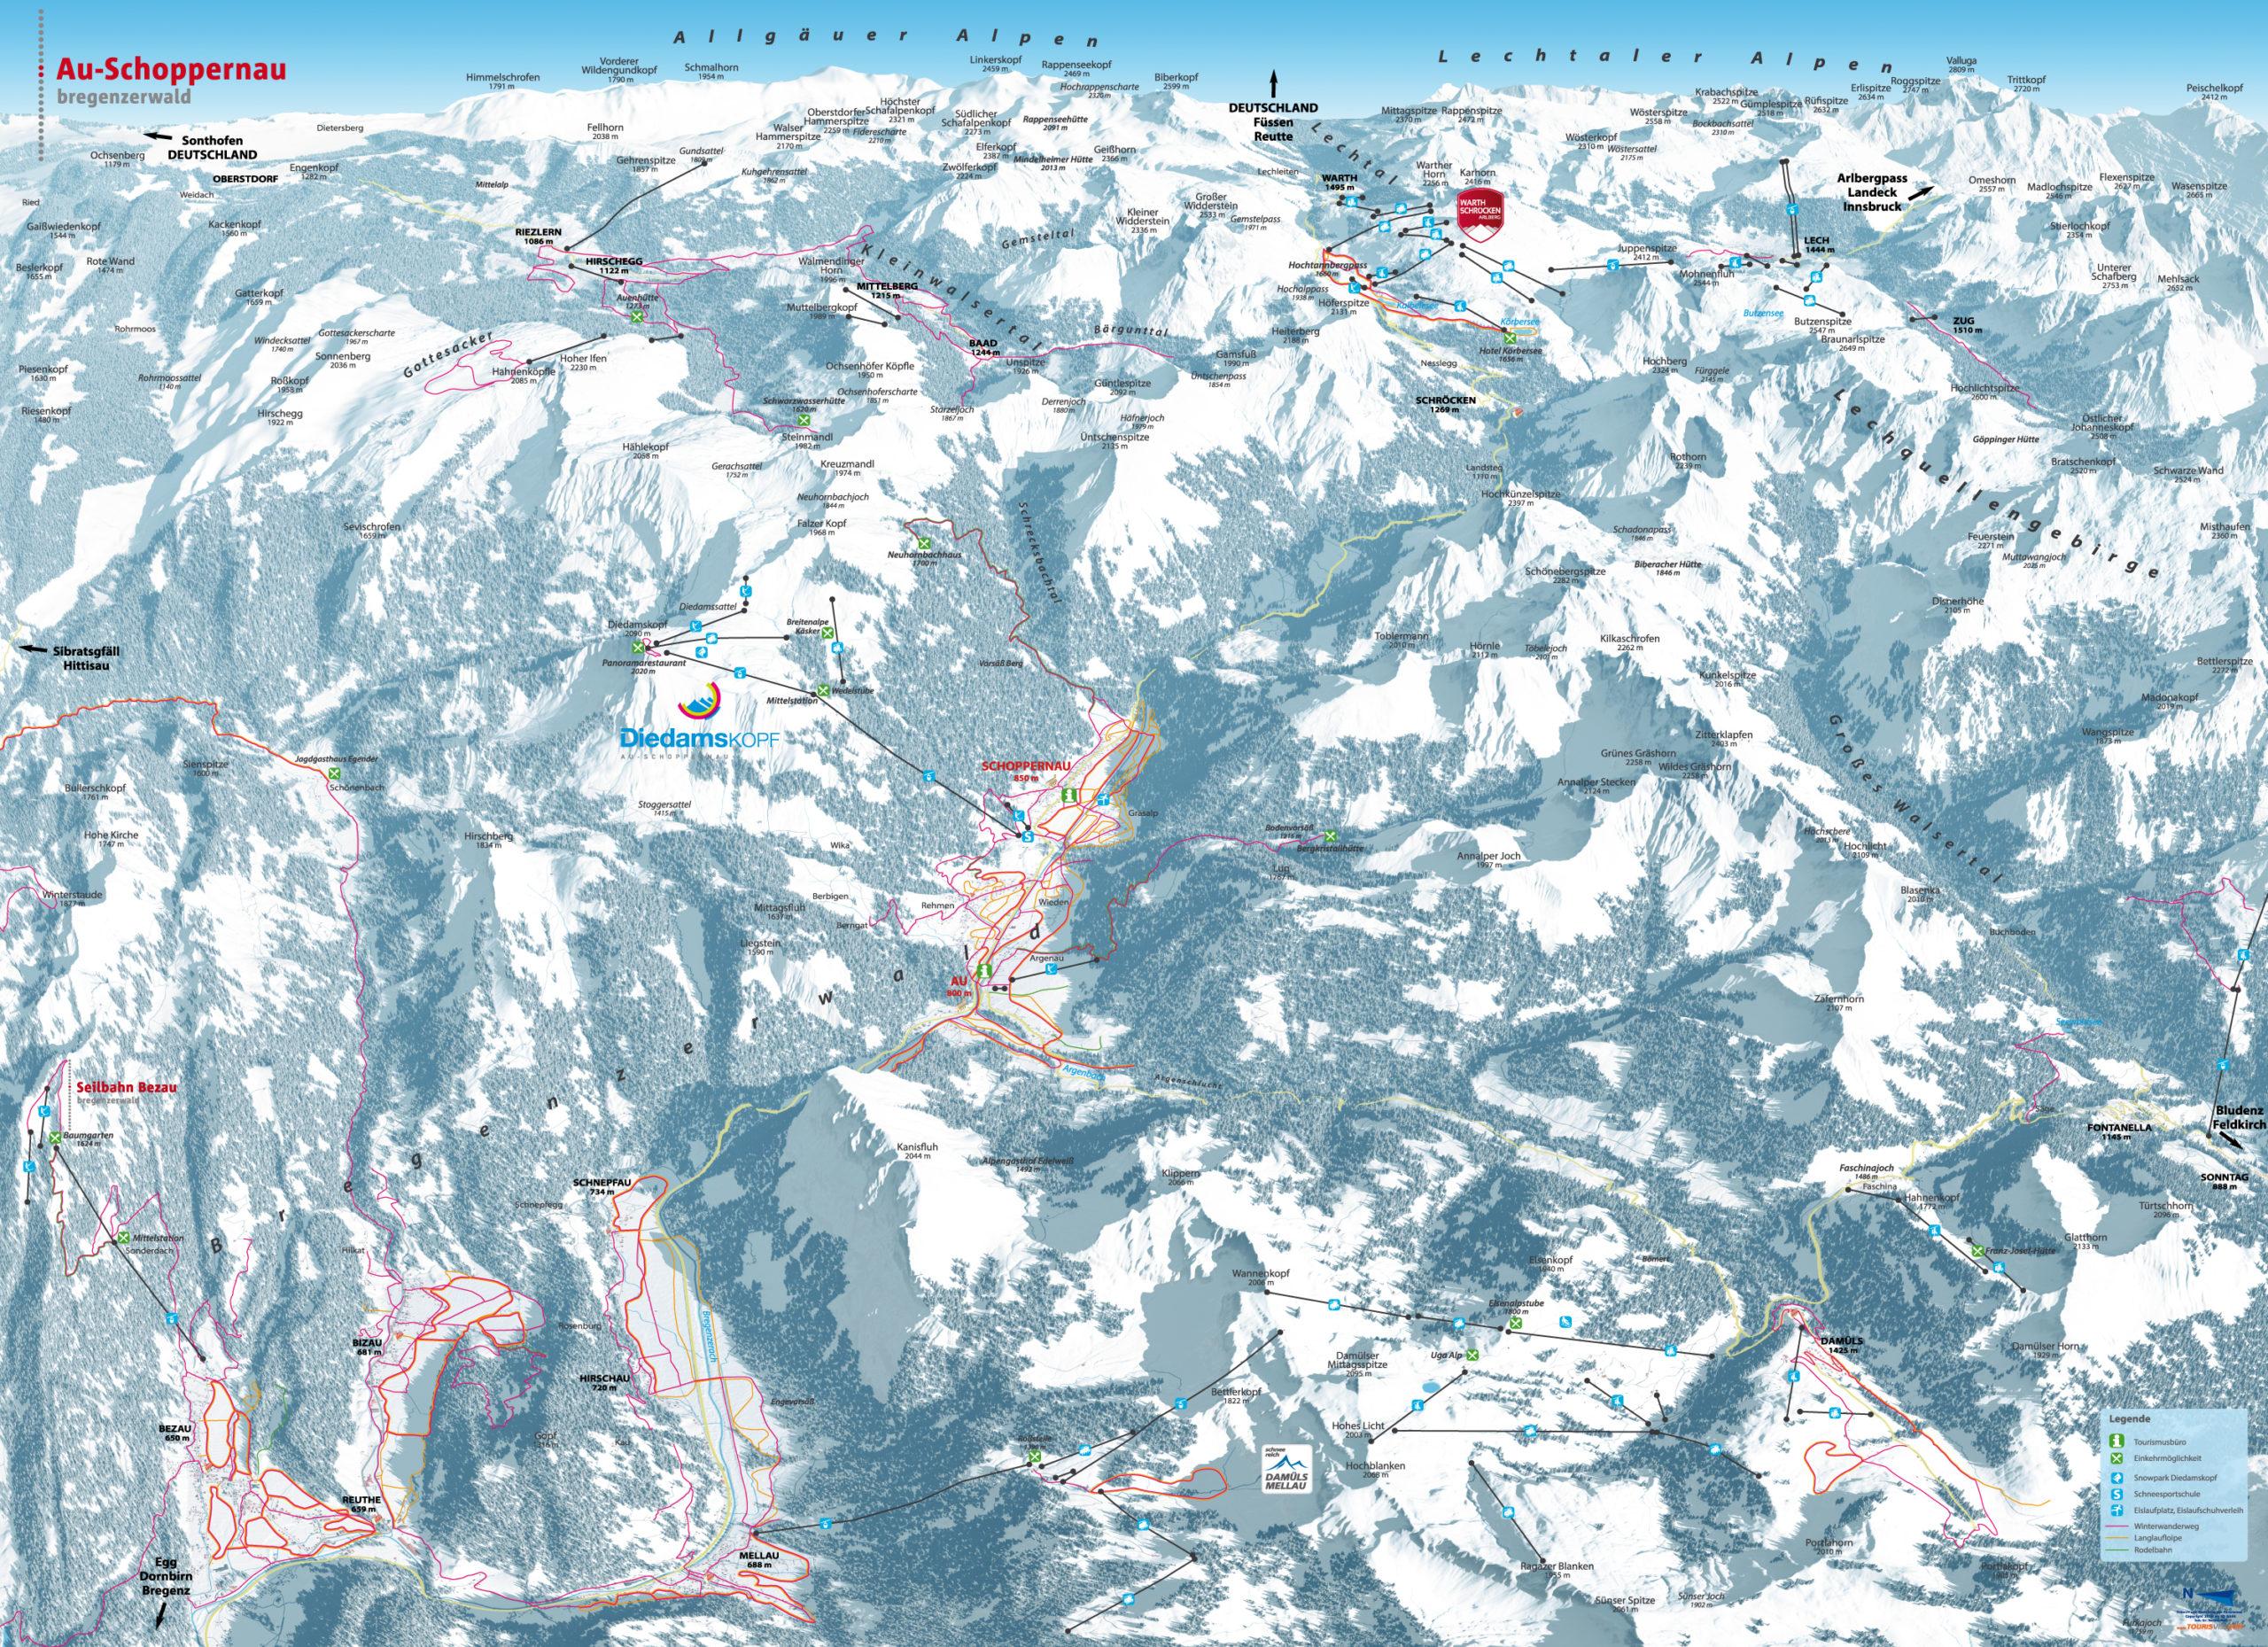 3D Panoramakarte Au-Schoppernau - Winterpanorama